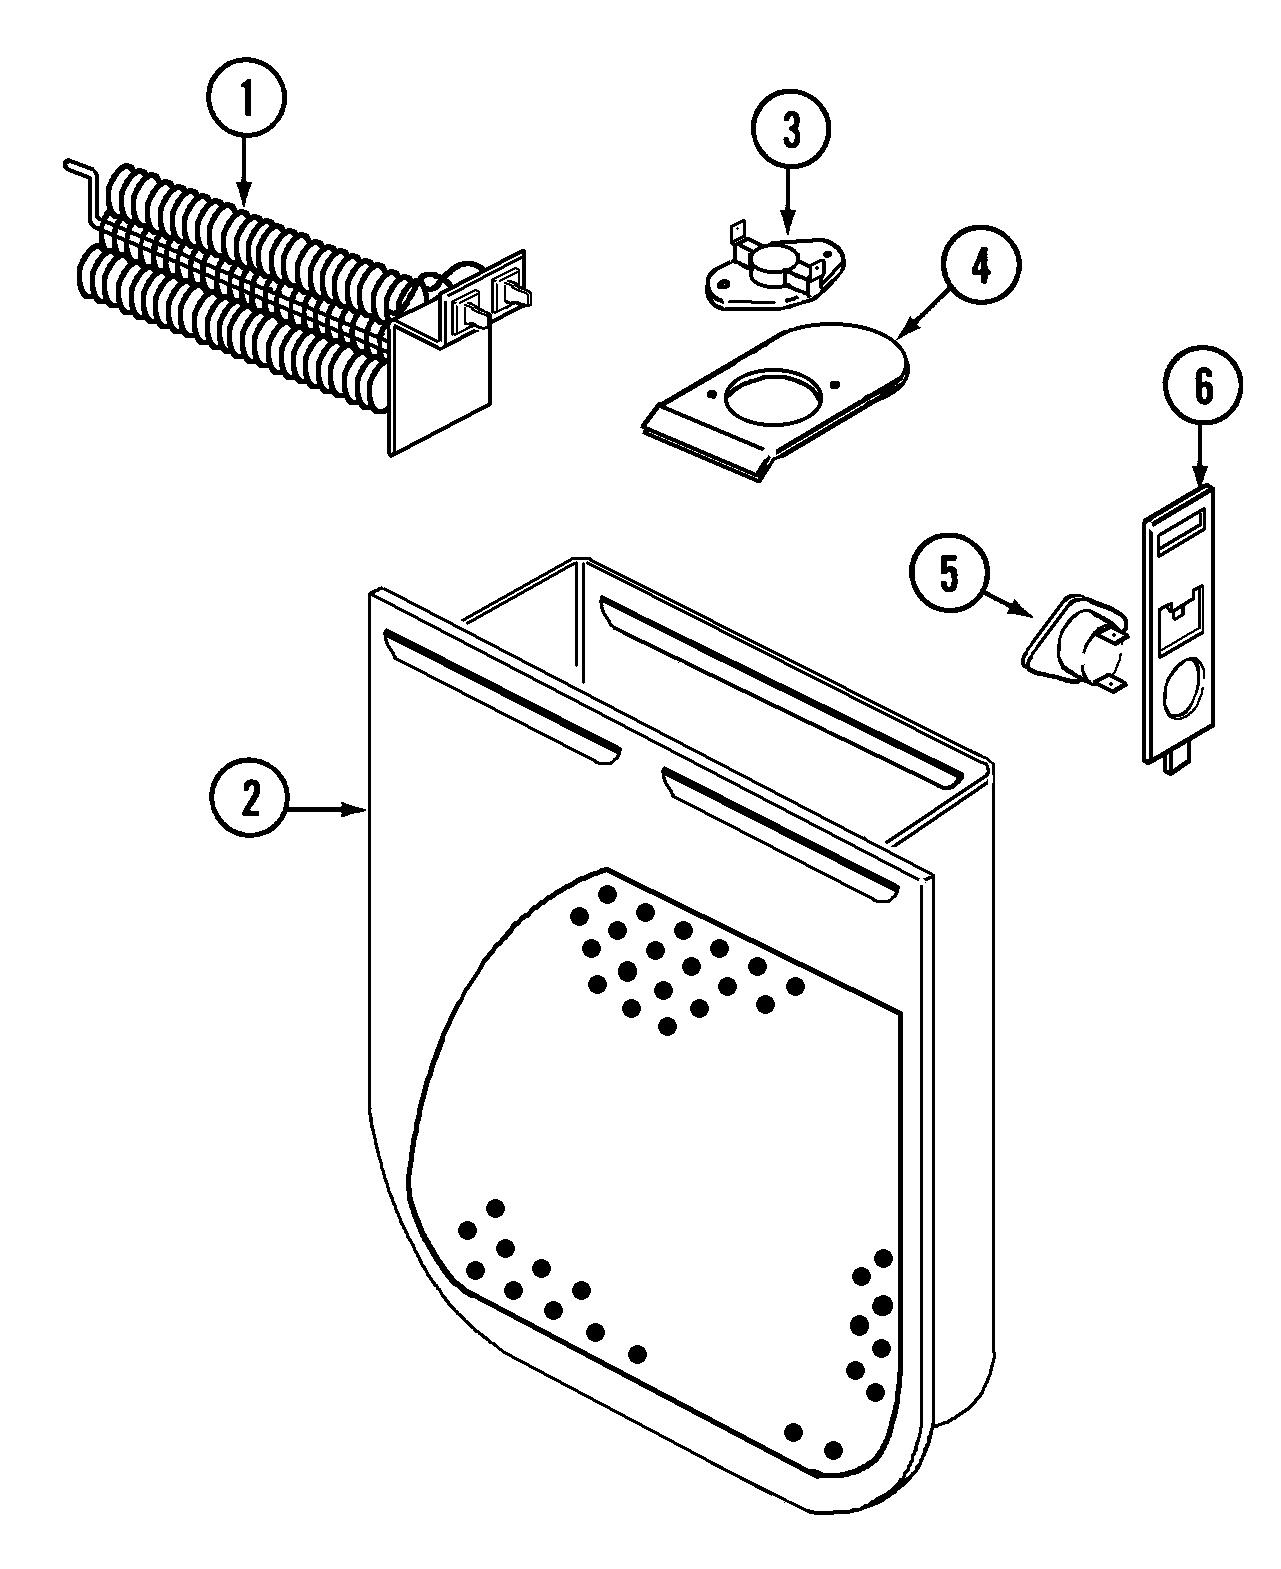 hight resolution of wiring diagram for maytag dg312 gas dryer appliance repair forum wiring diagram show